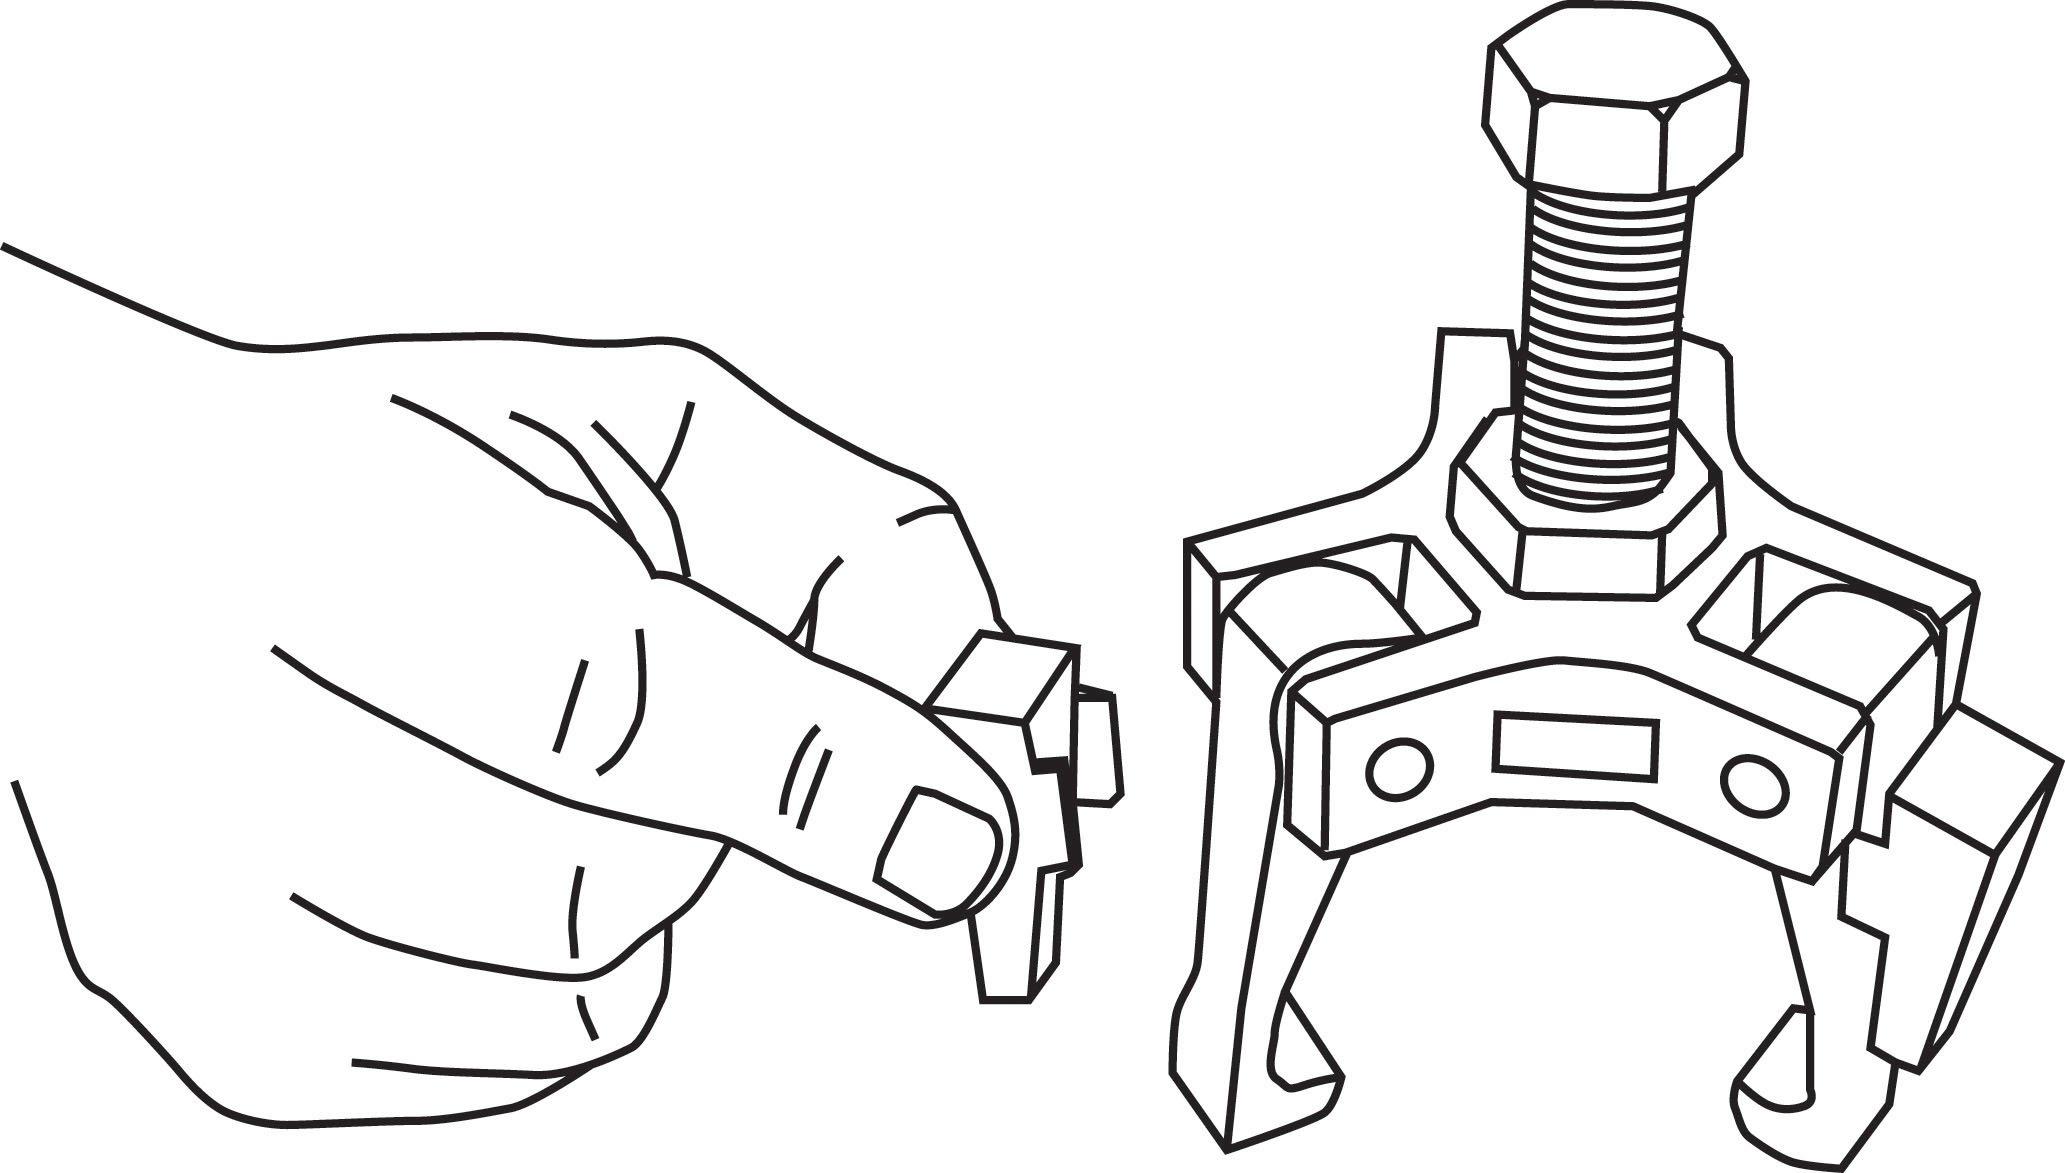 Lisle 51450 Harmonic Damper Pulley Puller by Lisle (Image #2)